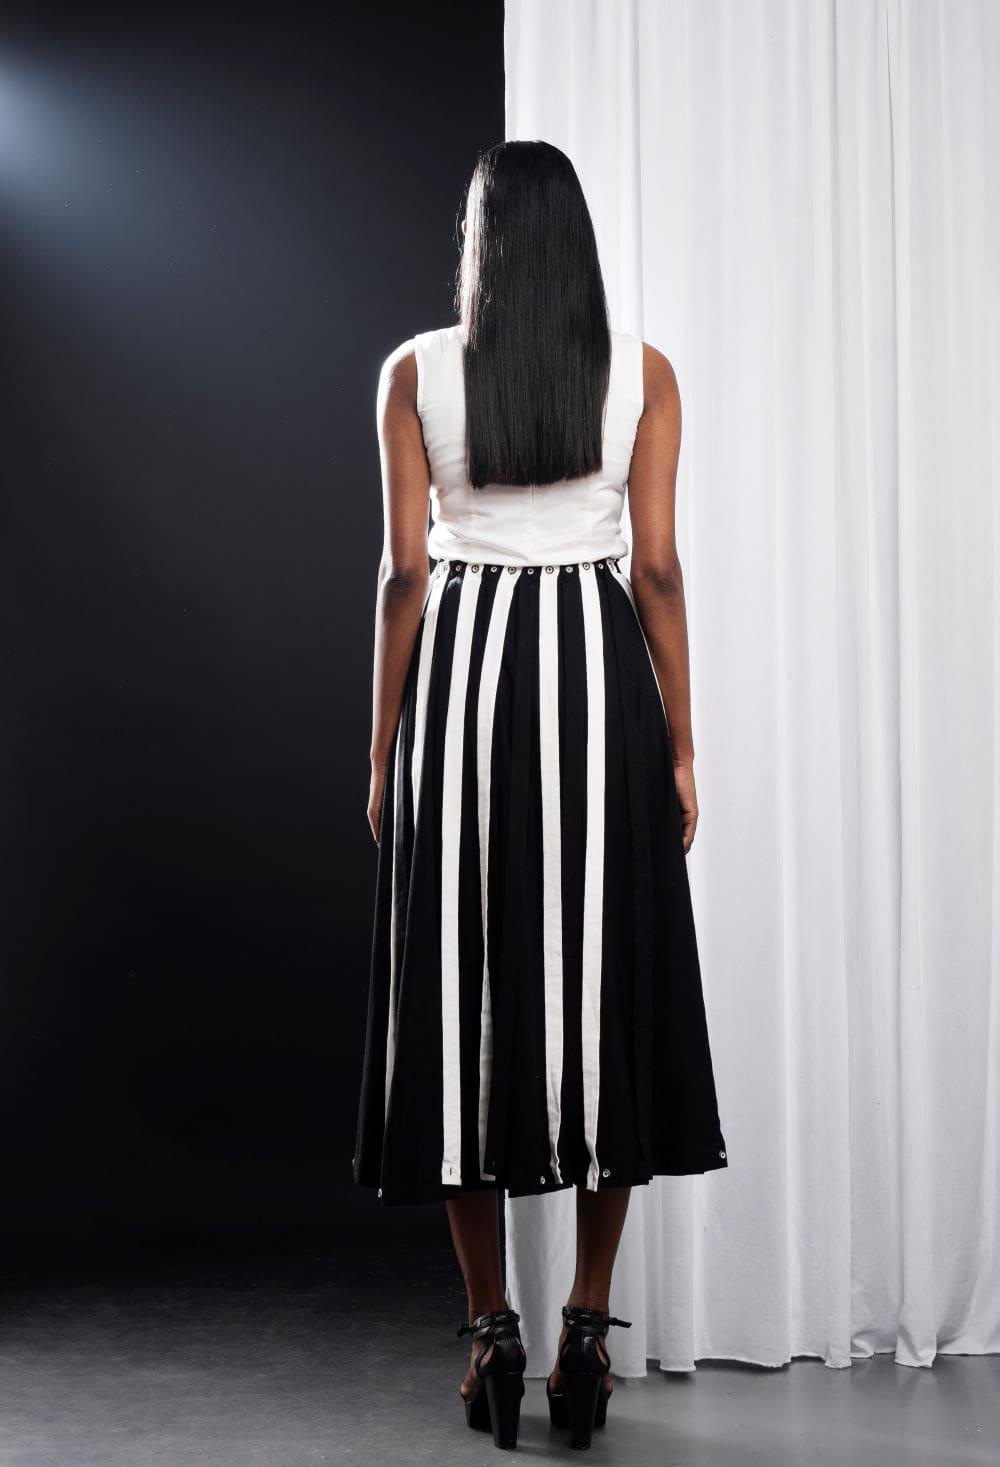 STOREAT44 | Best Black & White Clothing Brand | 5